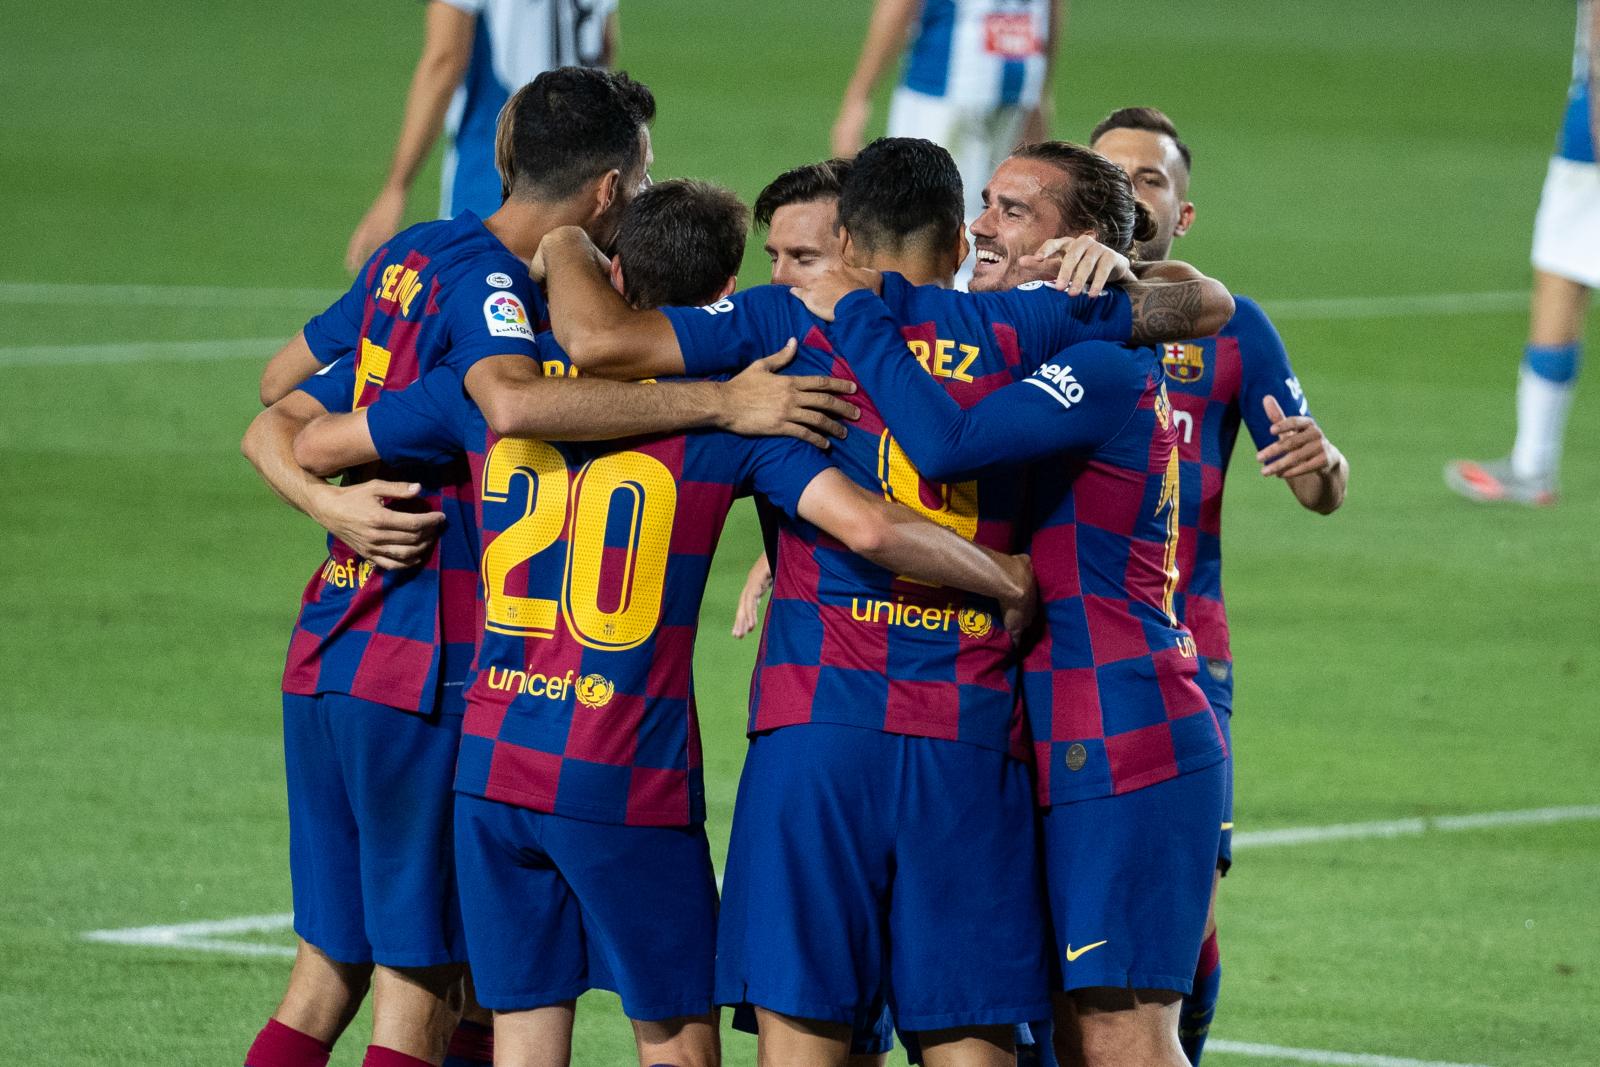 Вальядолид — Барселона: прогноз на матч 36-го тура Ла Лиги